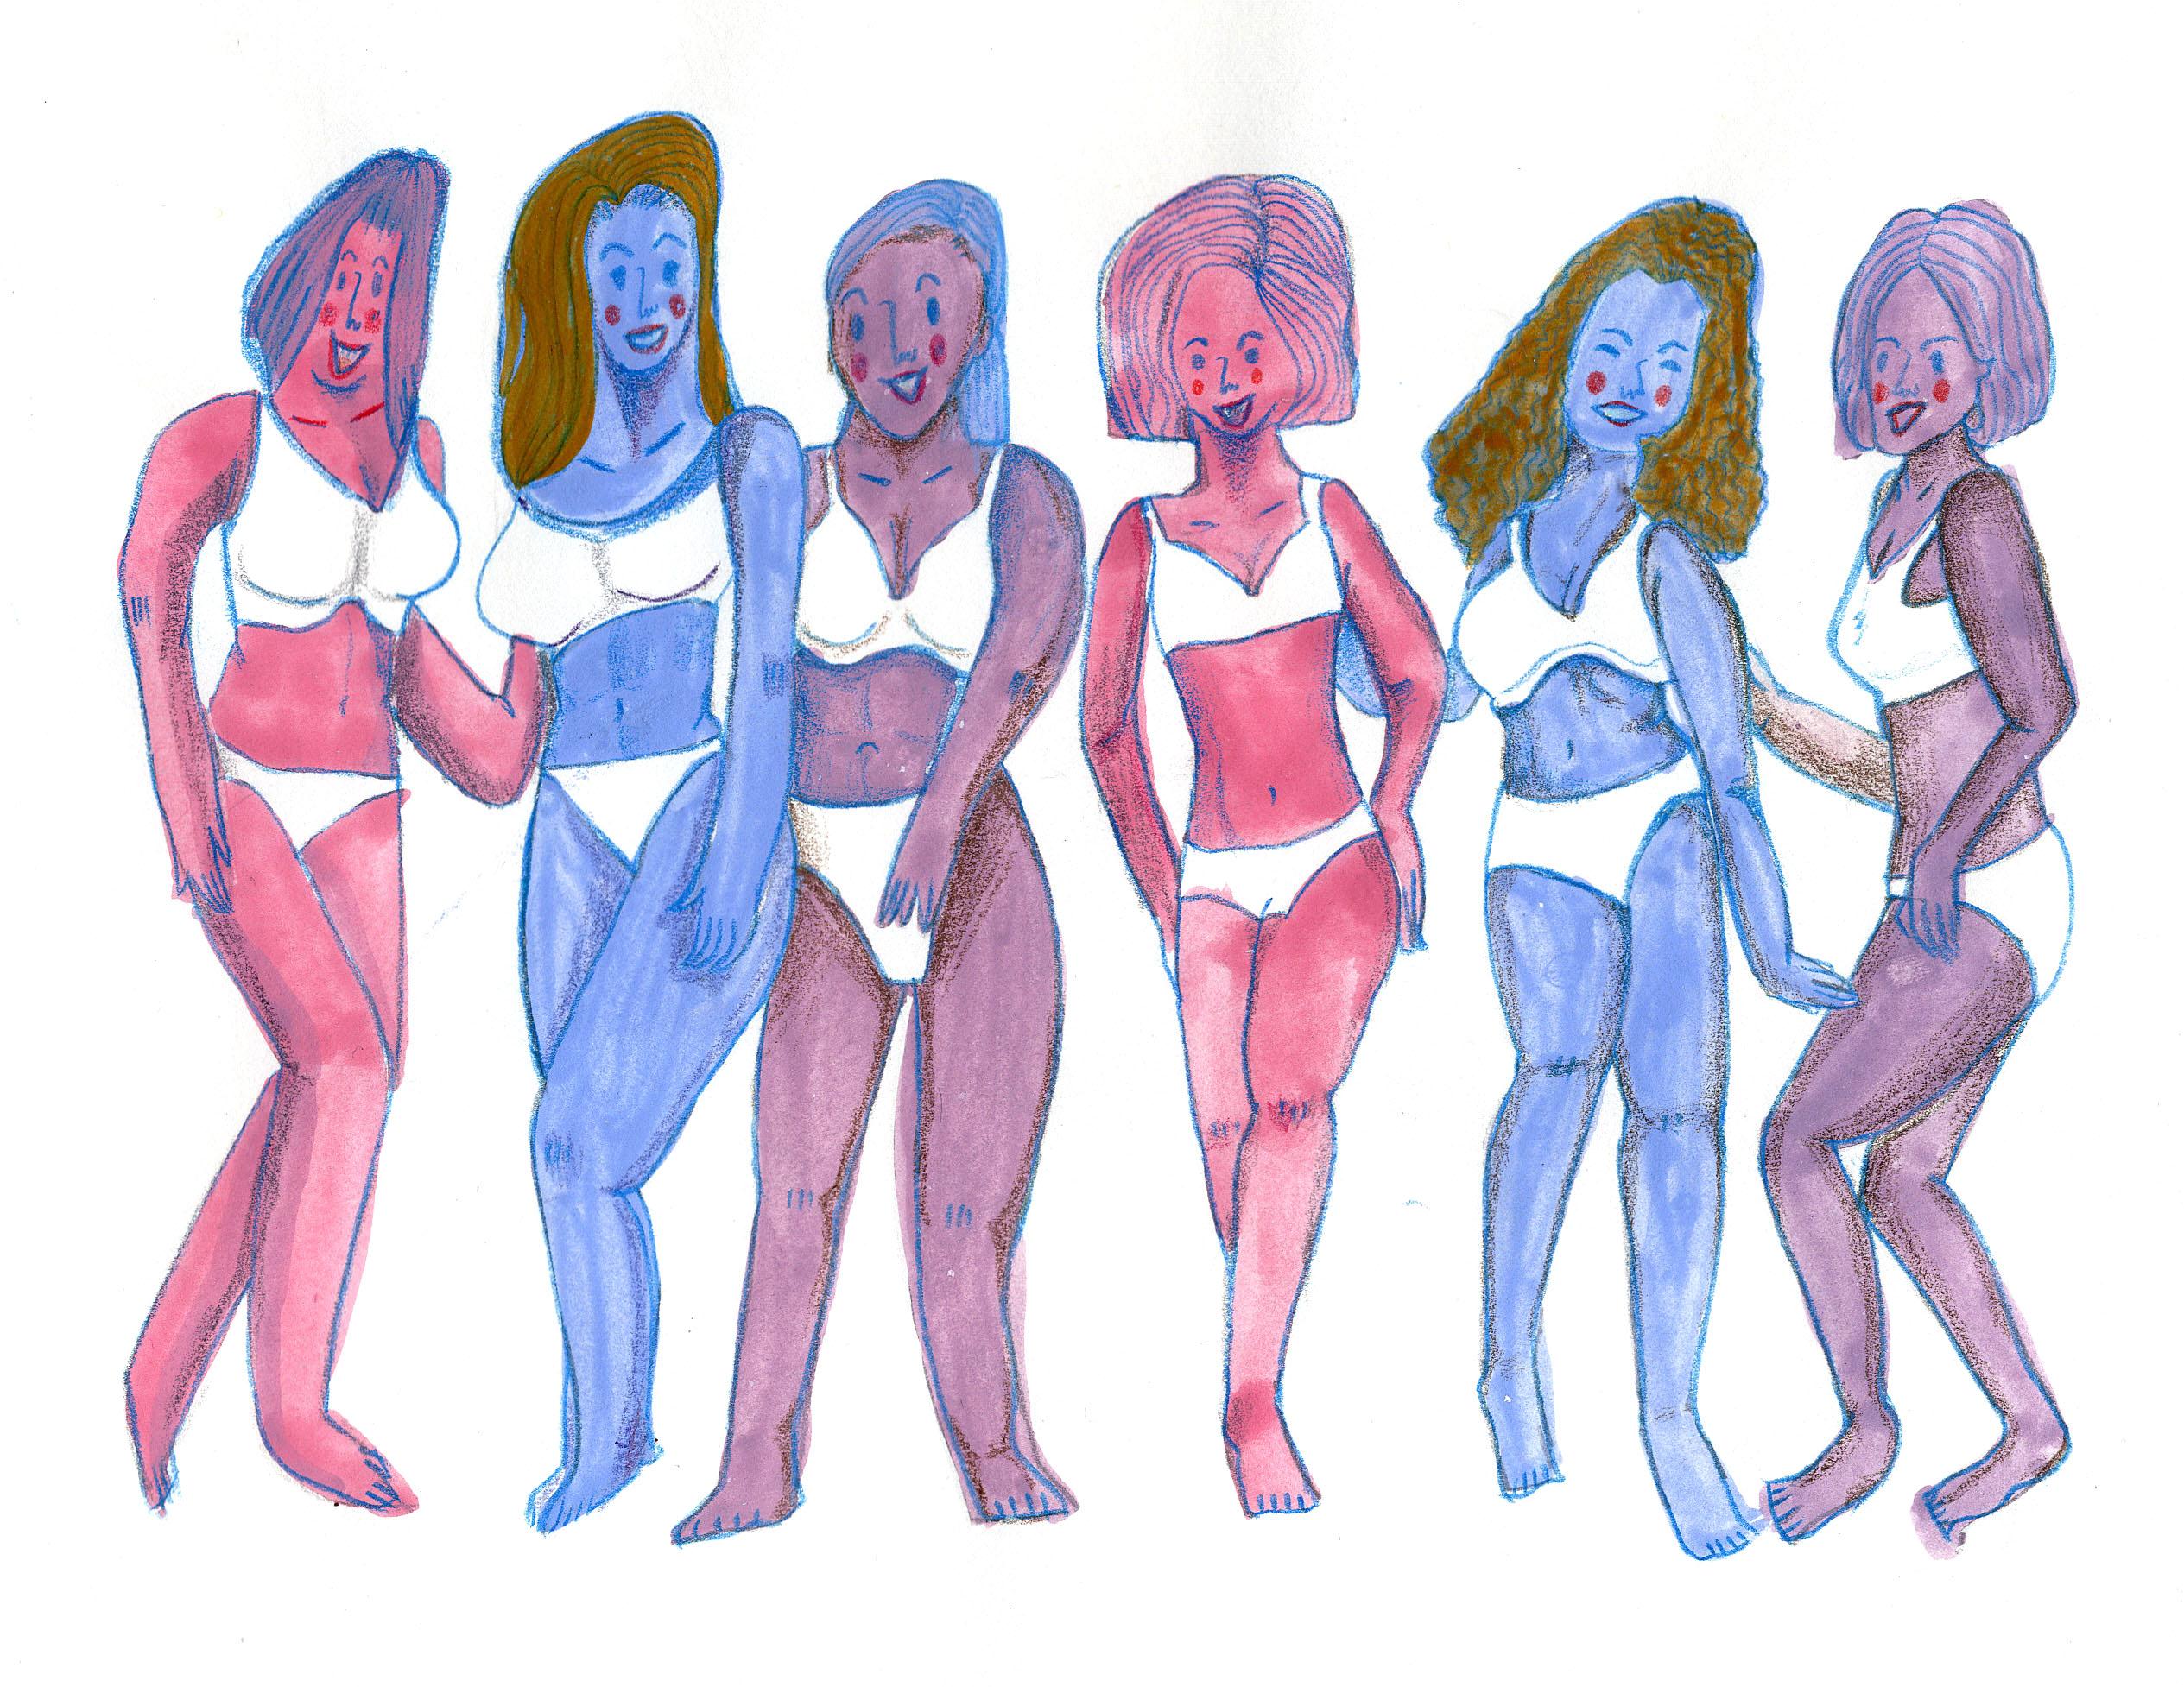 Real beauty, women, illustration